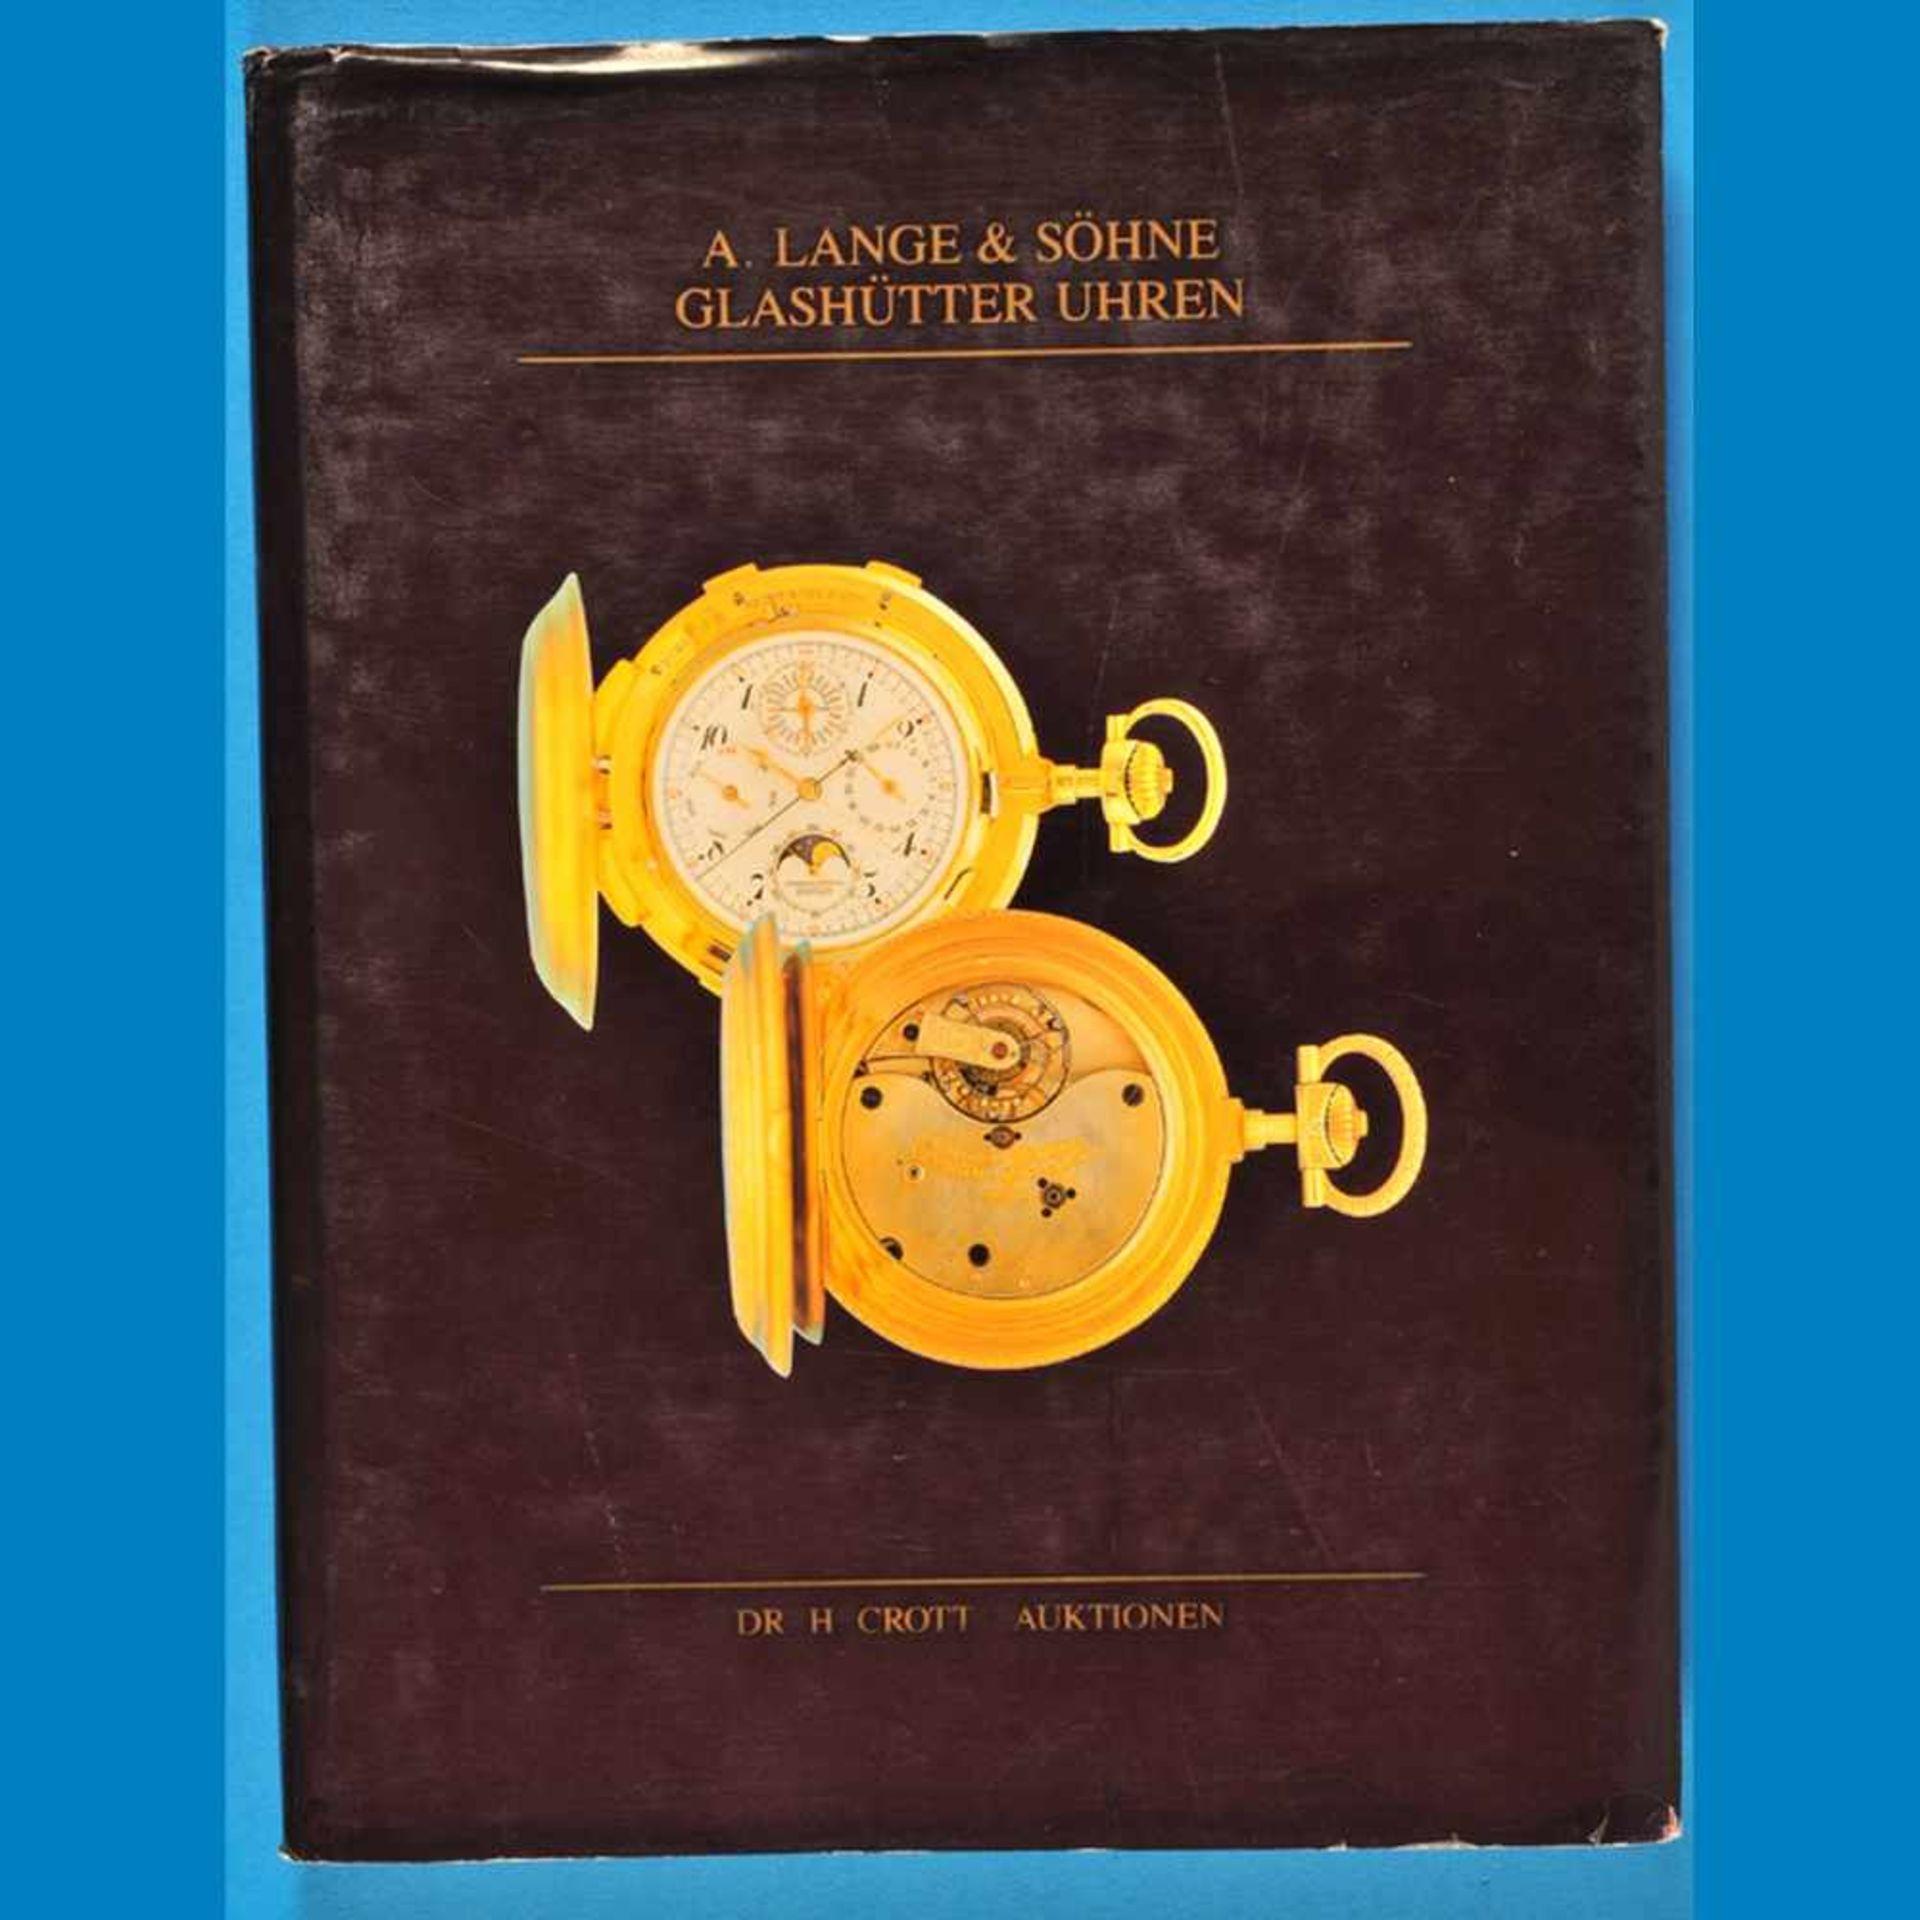 Dr. H. Crott, A. Lange & Söhne, Glashütter Uhren, Katalog von 1991